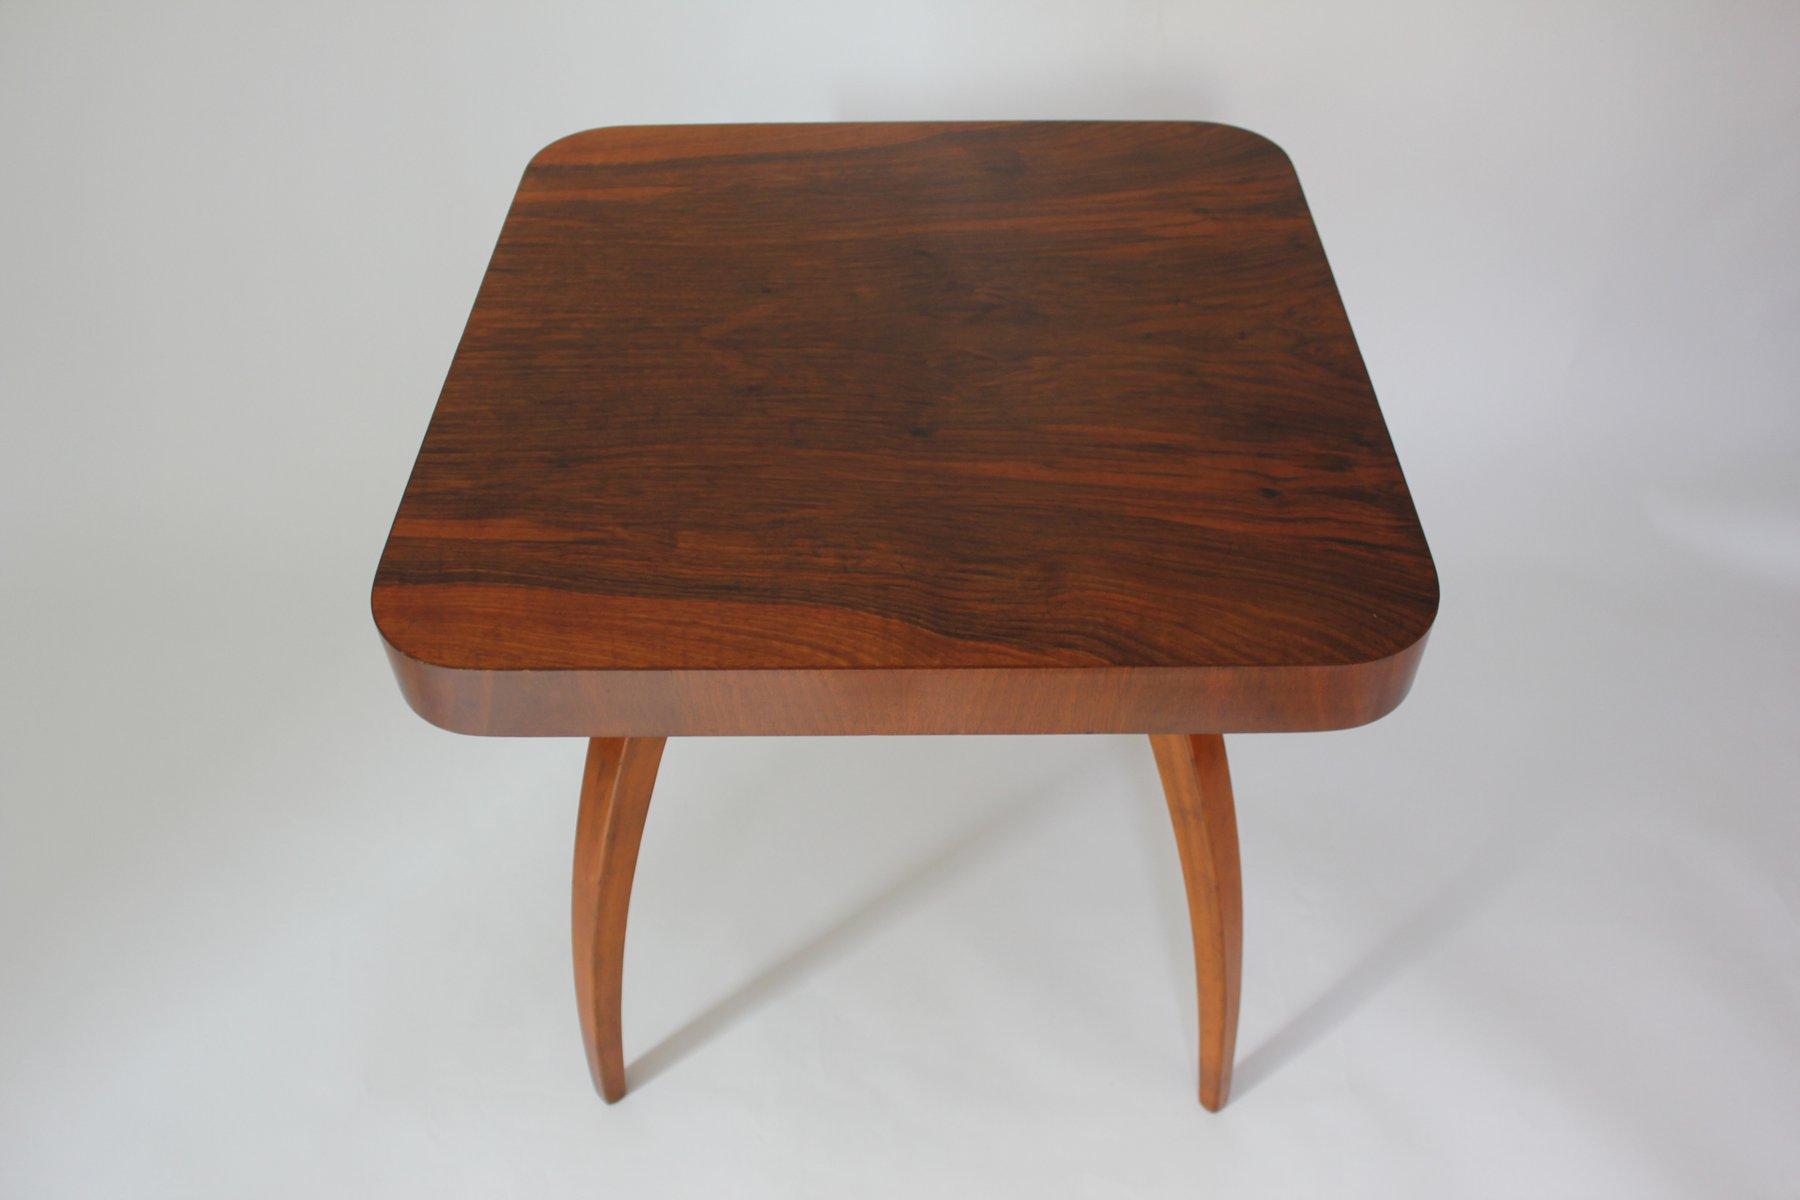 Spider Walnut Coffee Table by Jindrich Halabala for UP Zavody